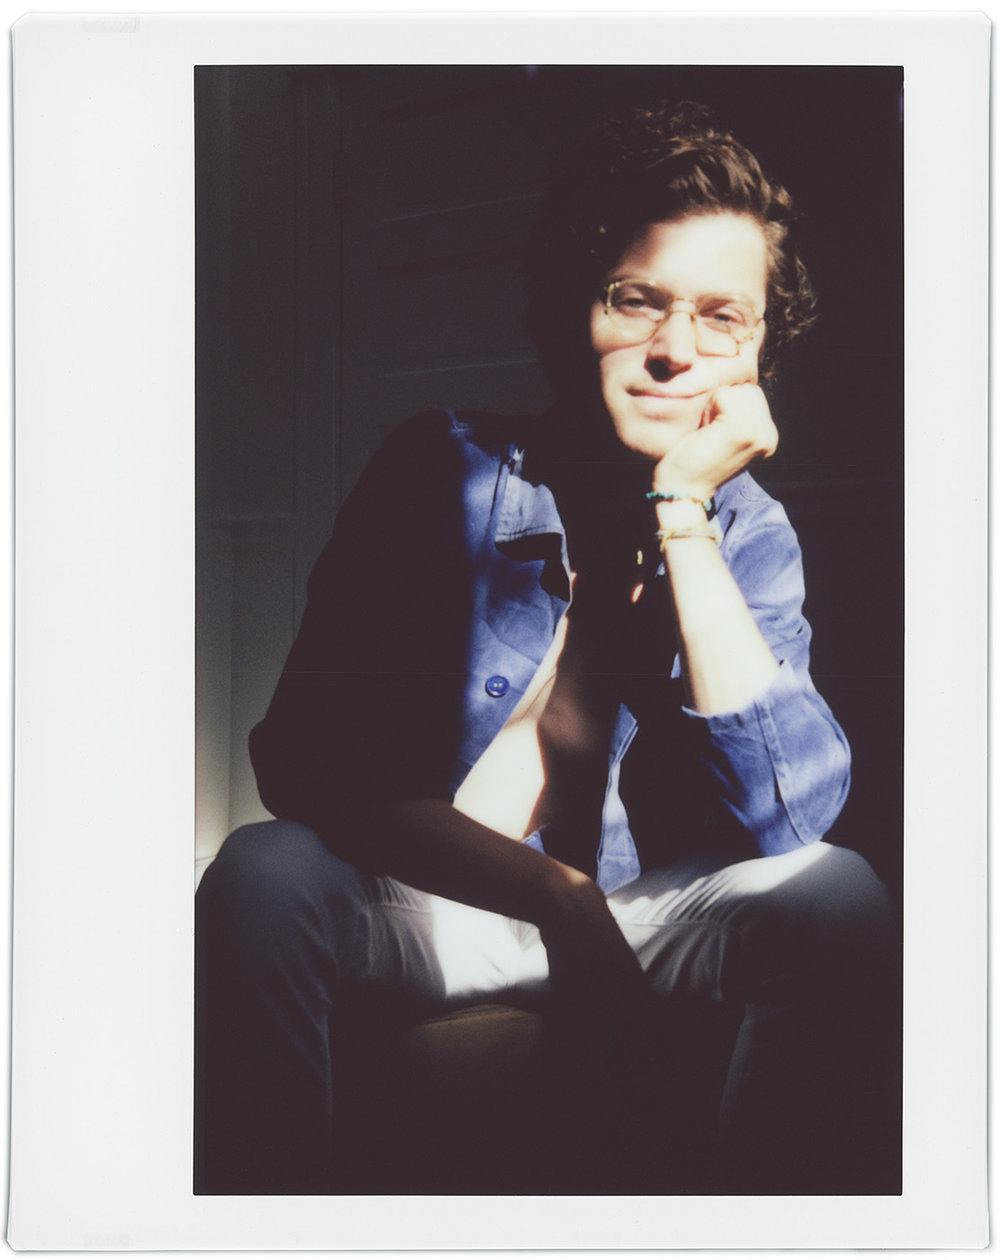 Nolan Green, Ceramist, Songwriter, Musician & Startups (USA)